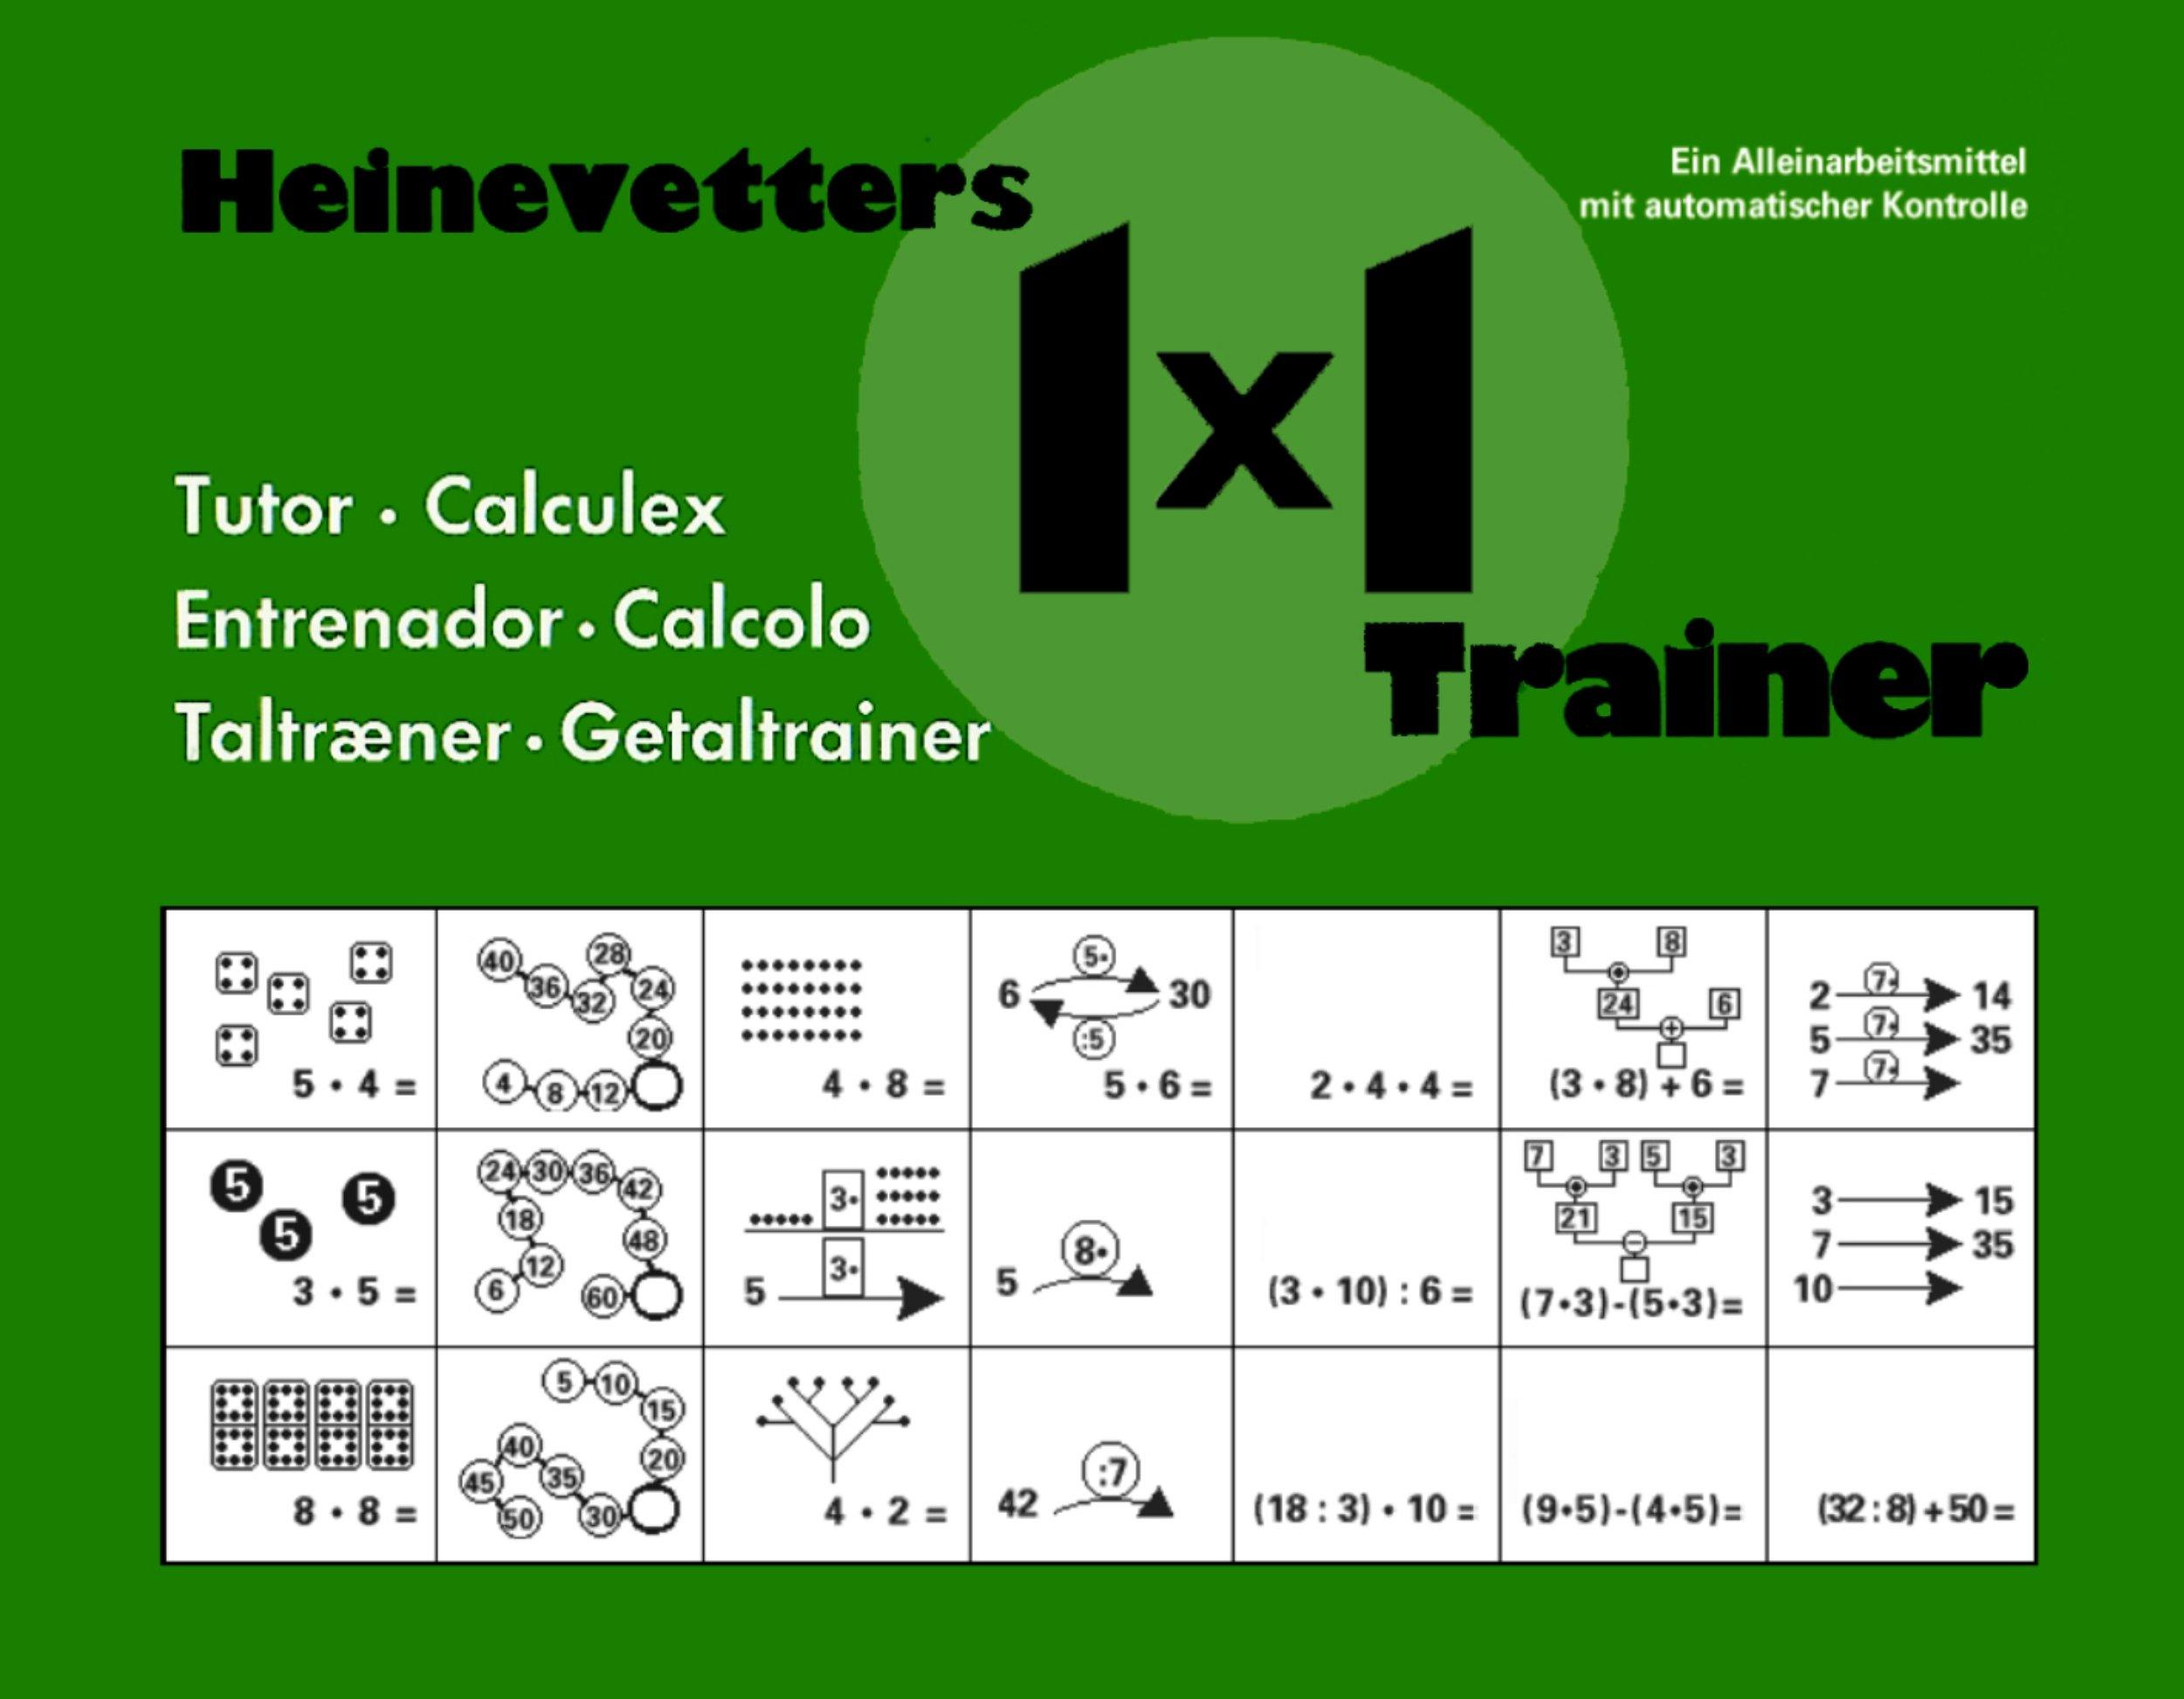 1x1 trainer